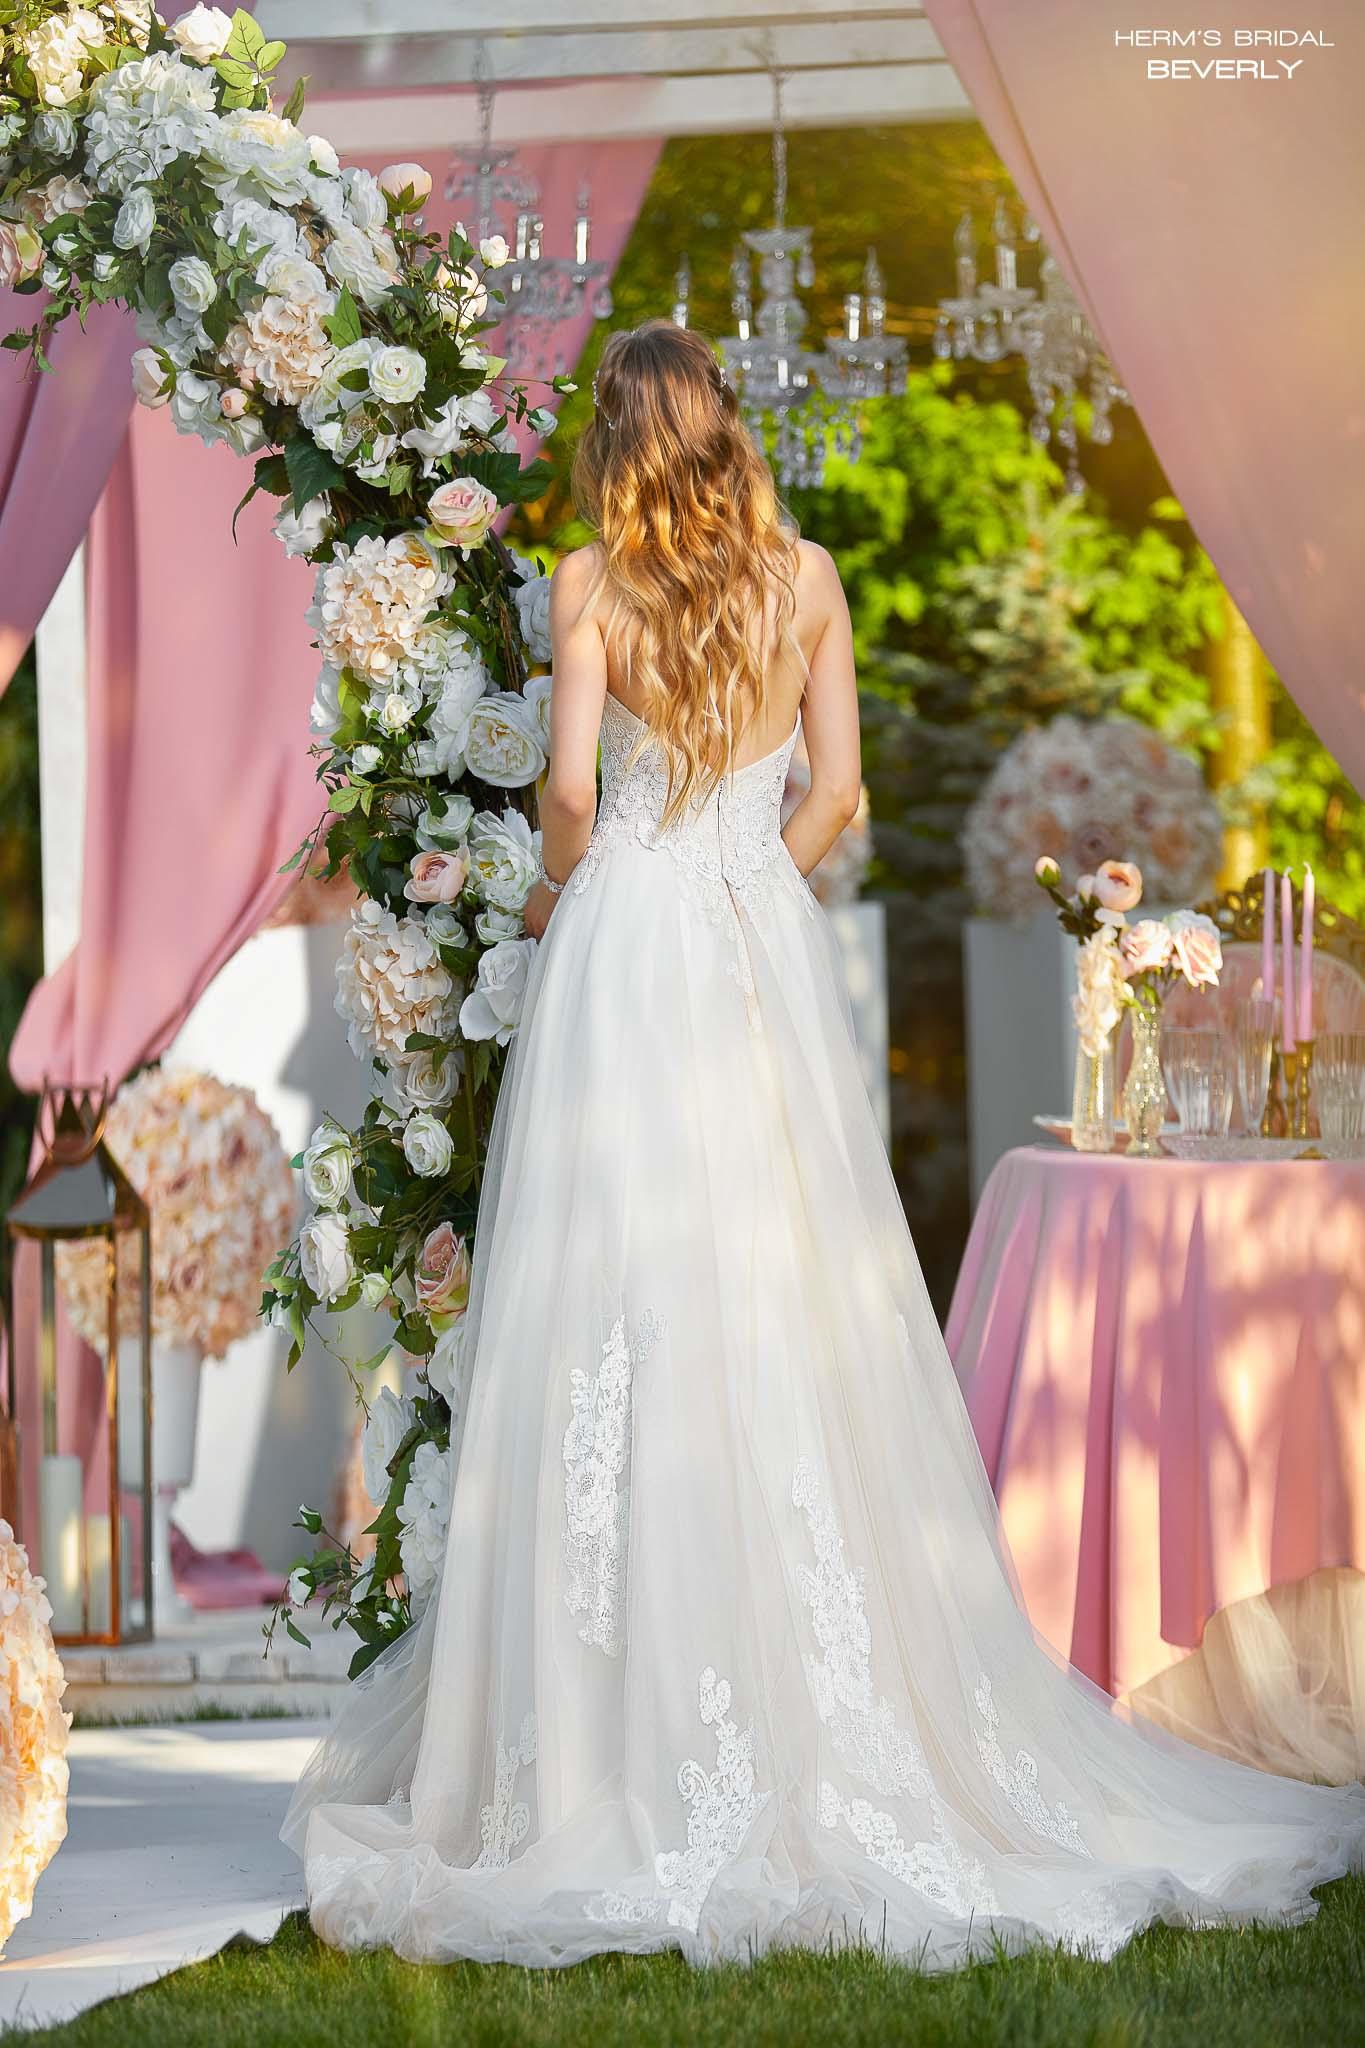 wedding dress Herm's Bridal Beverly